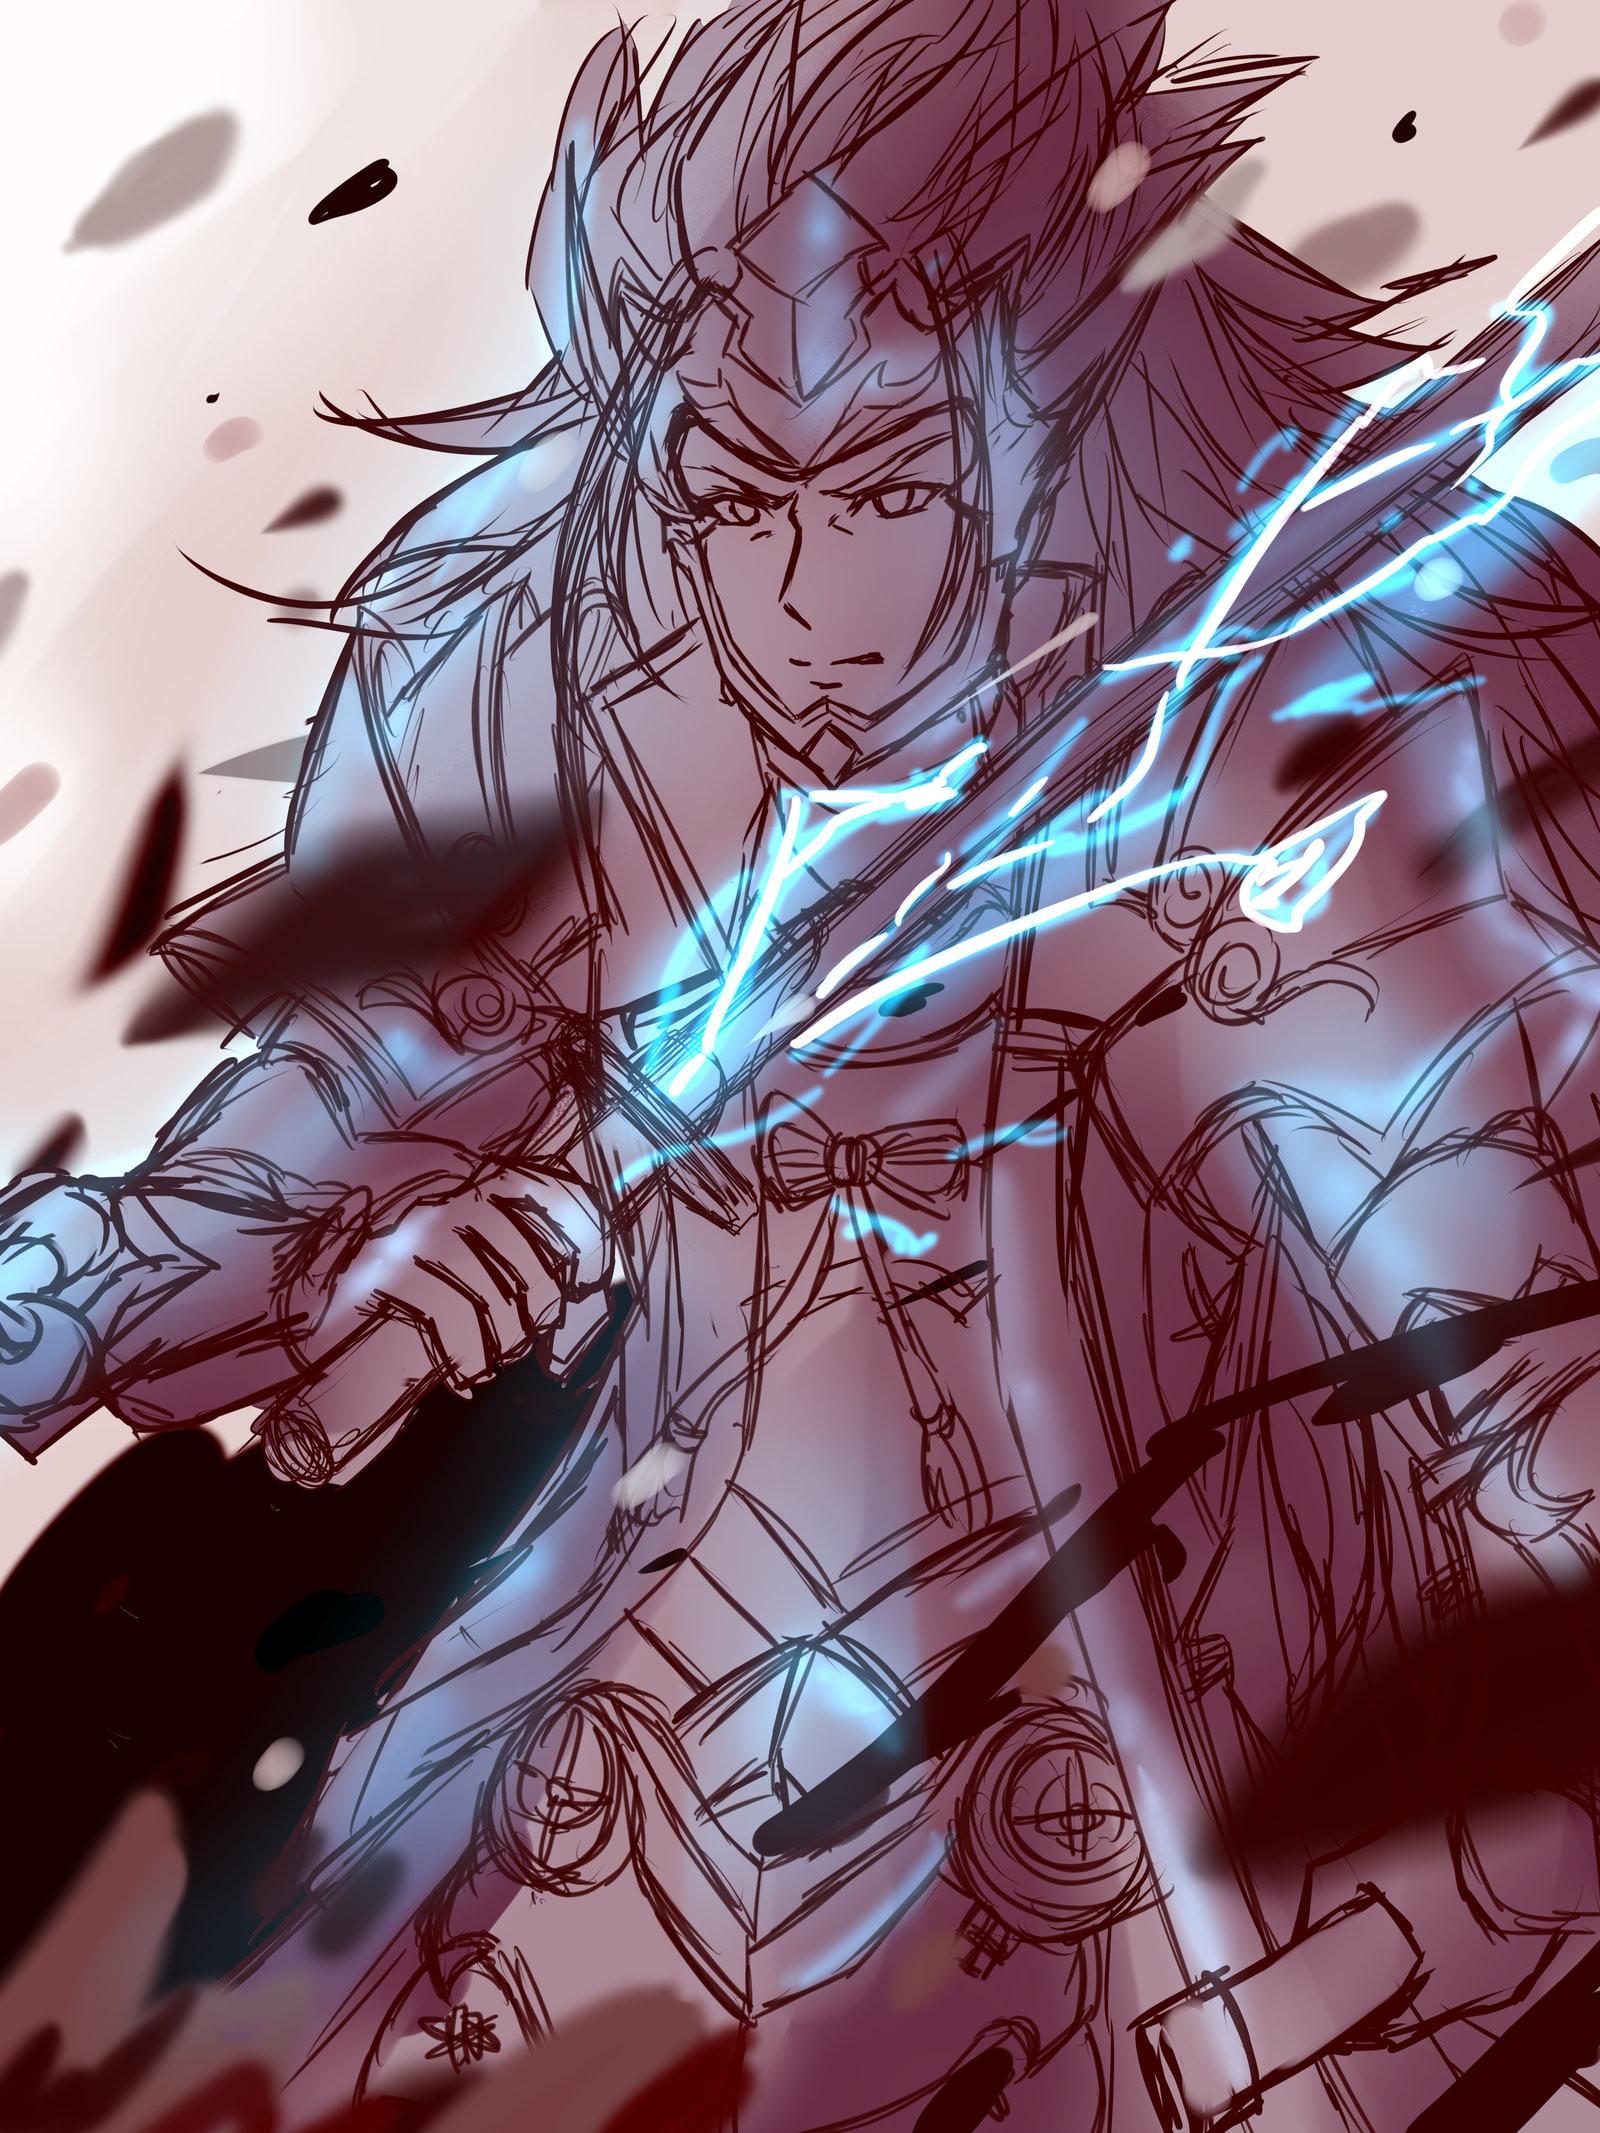 … Fire Emblem IF: Hoshido by OwlLisa